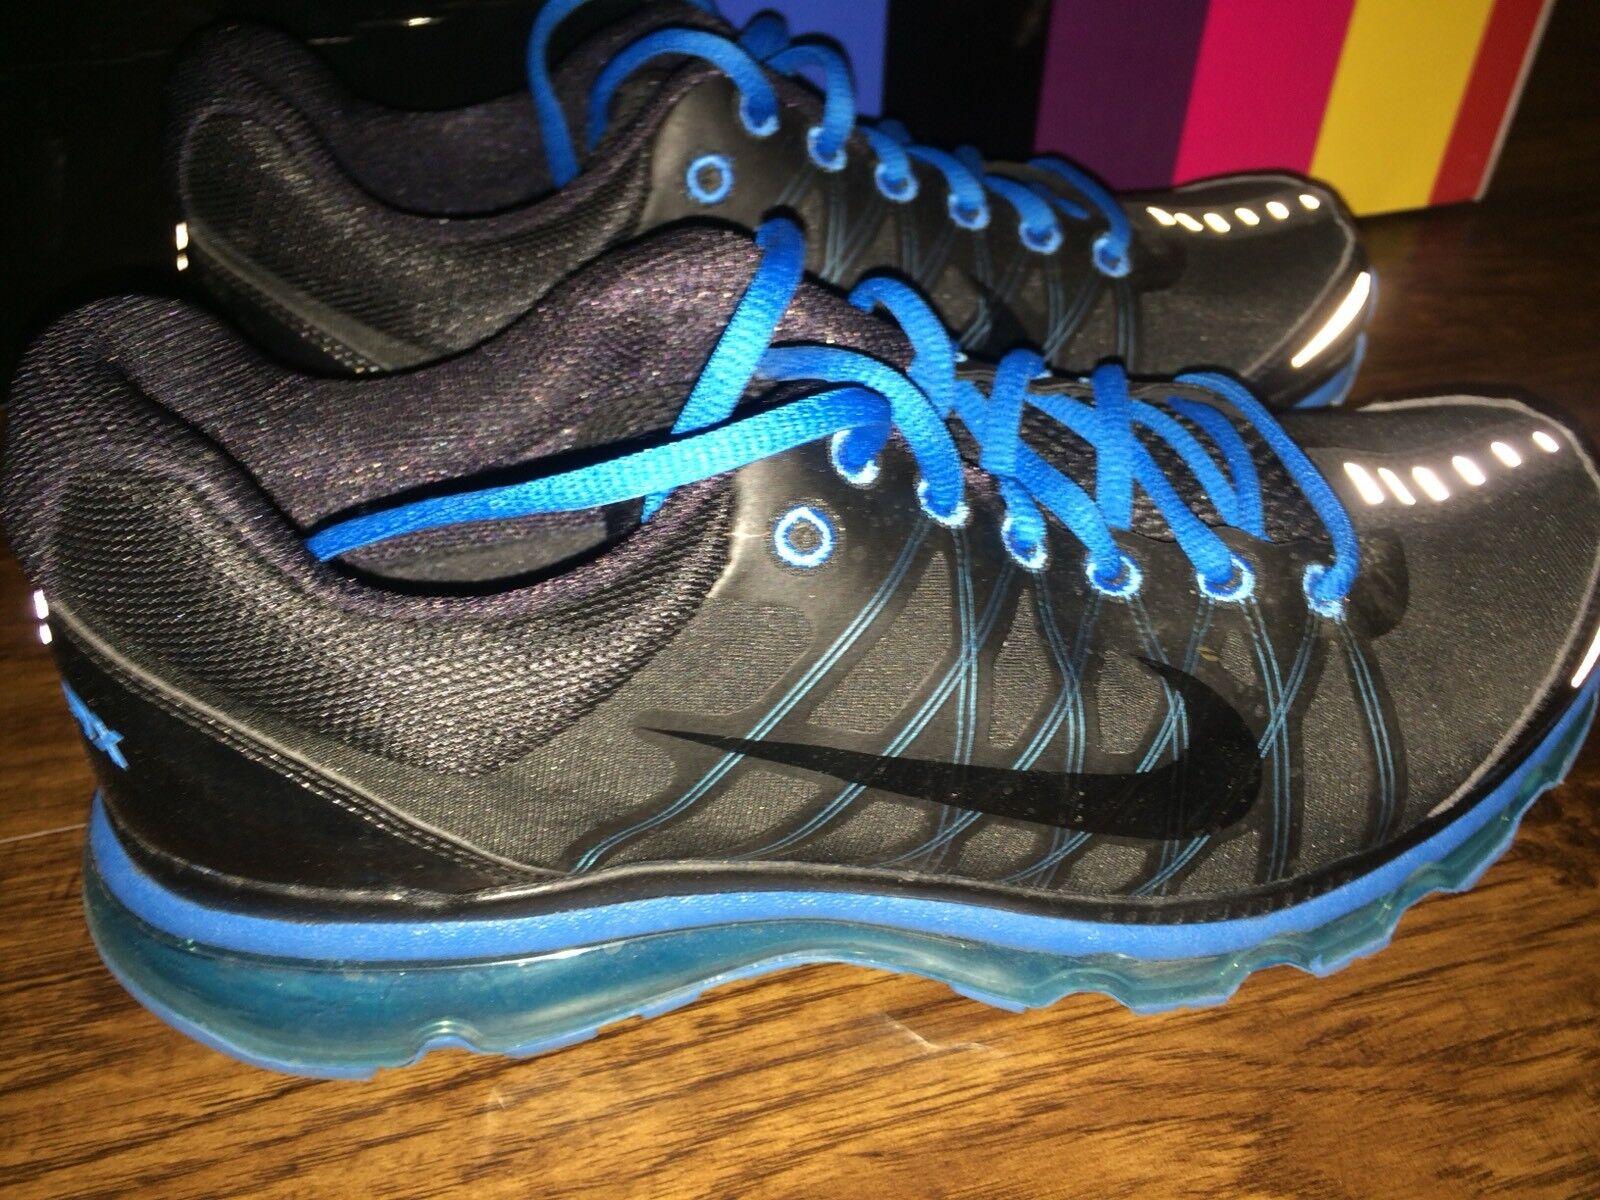 Nike Air Max 2009 Air Attack Pack Rare Parra Patta DS Eminem 10 Jordan Durant